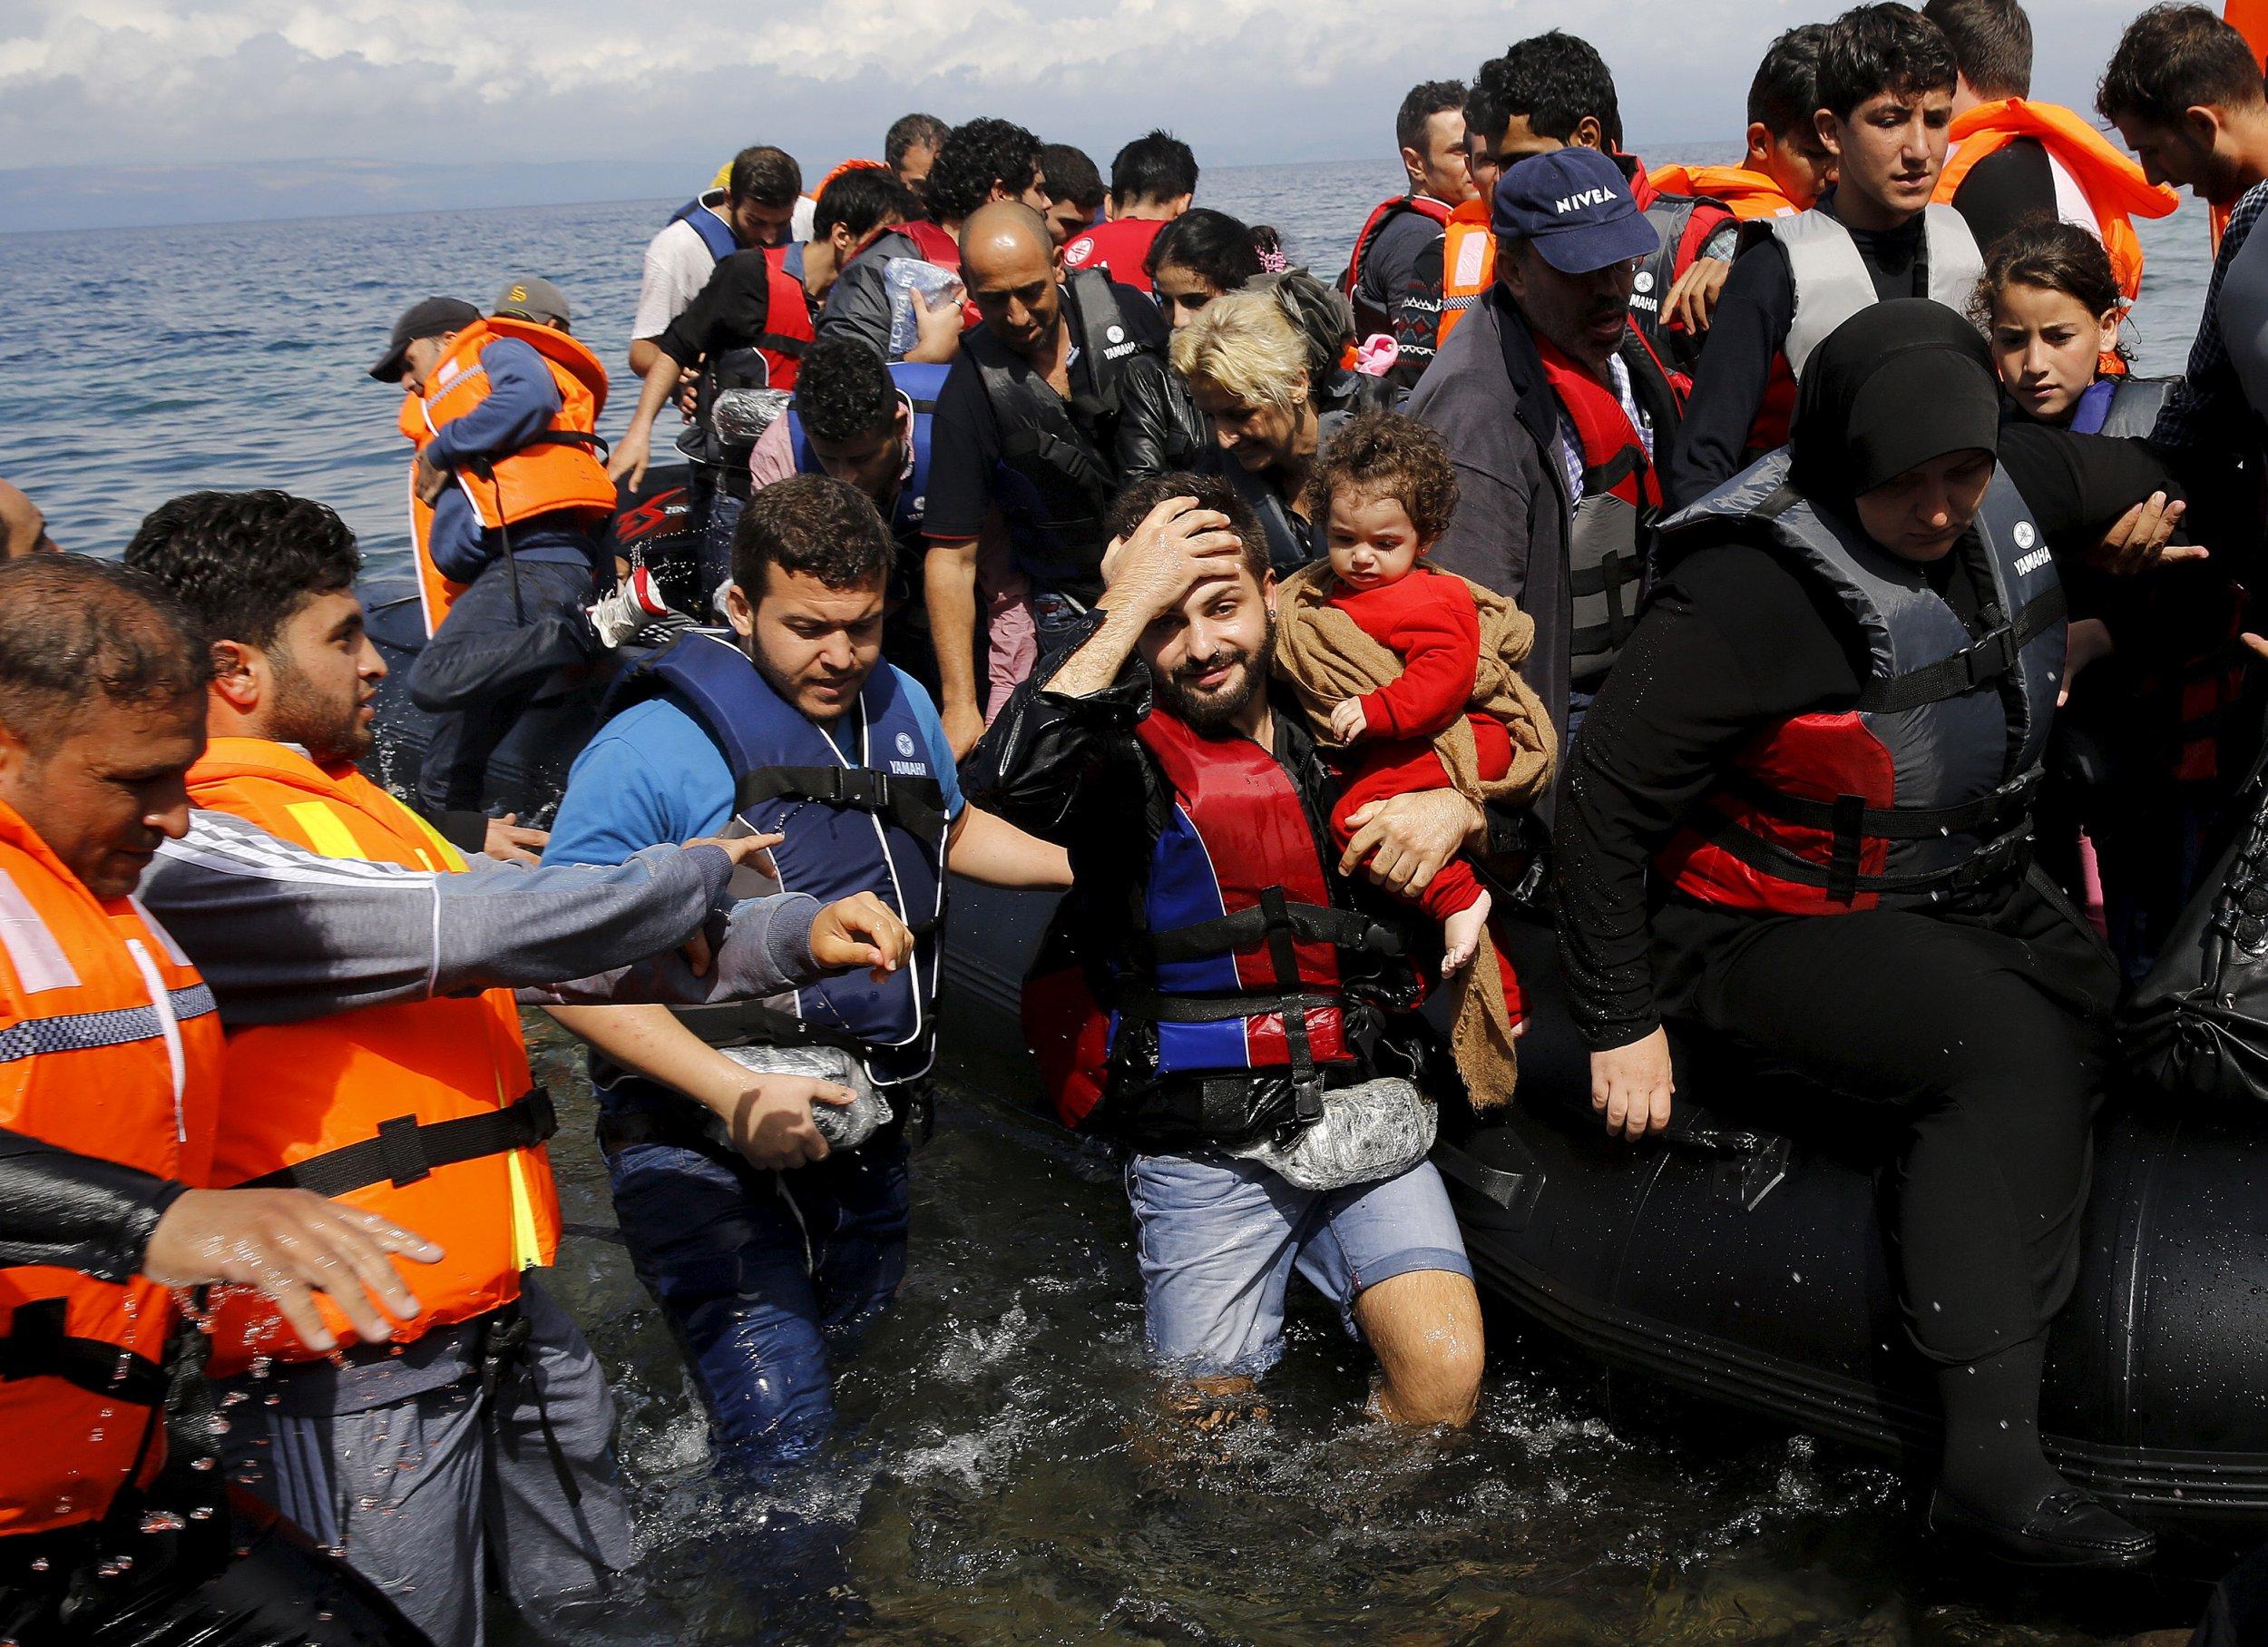 09_24_Refugees_01